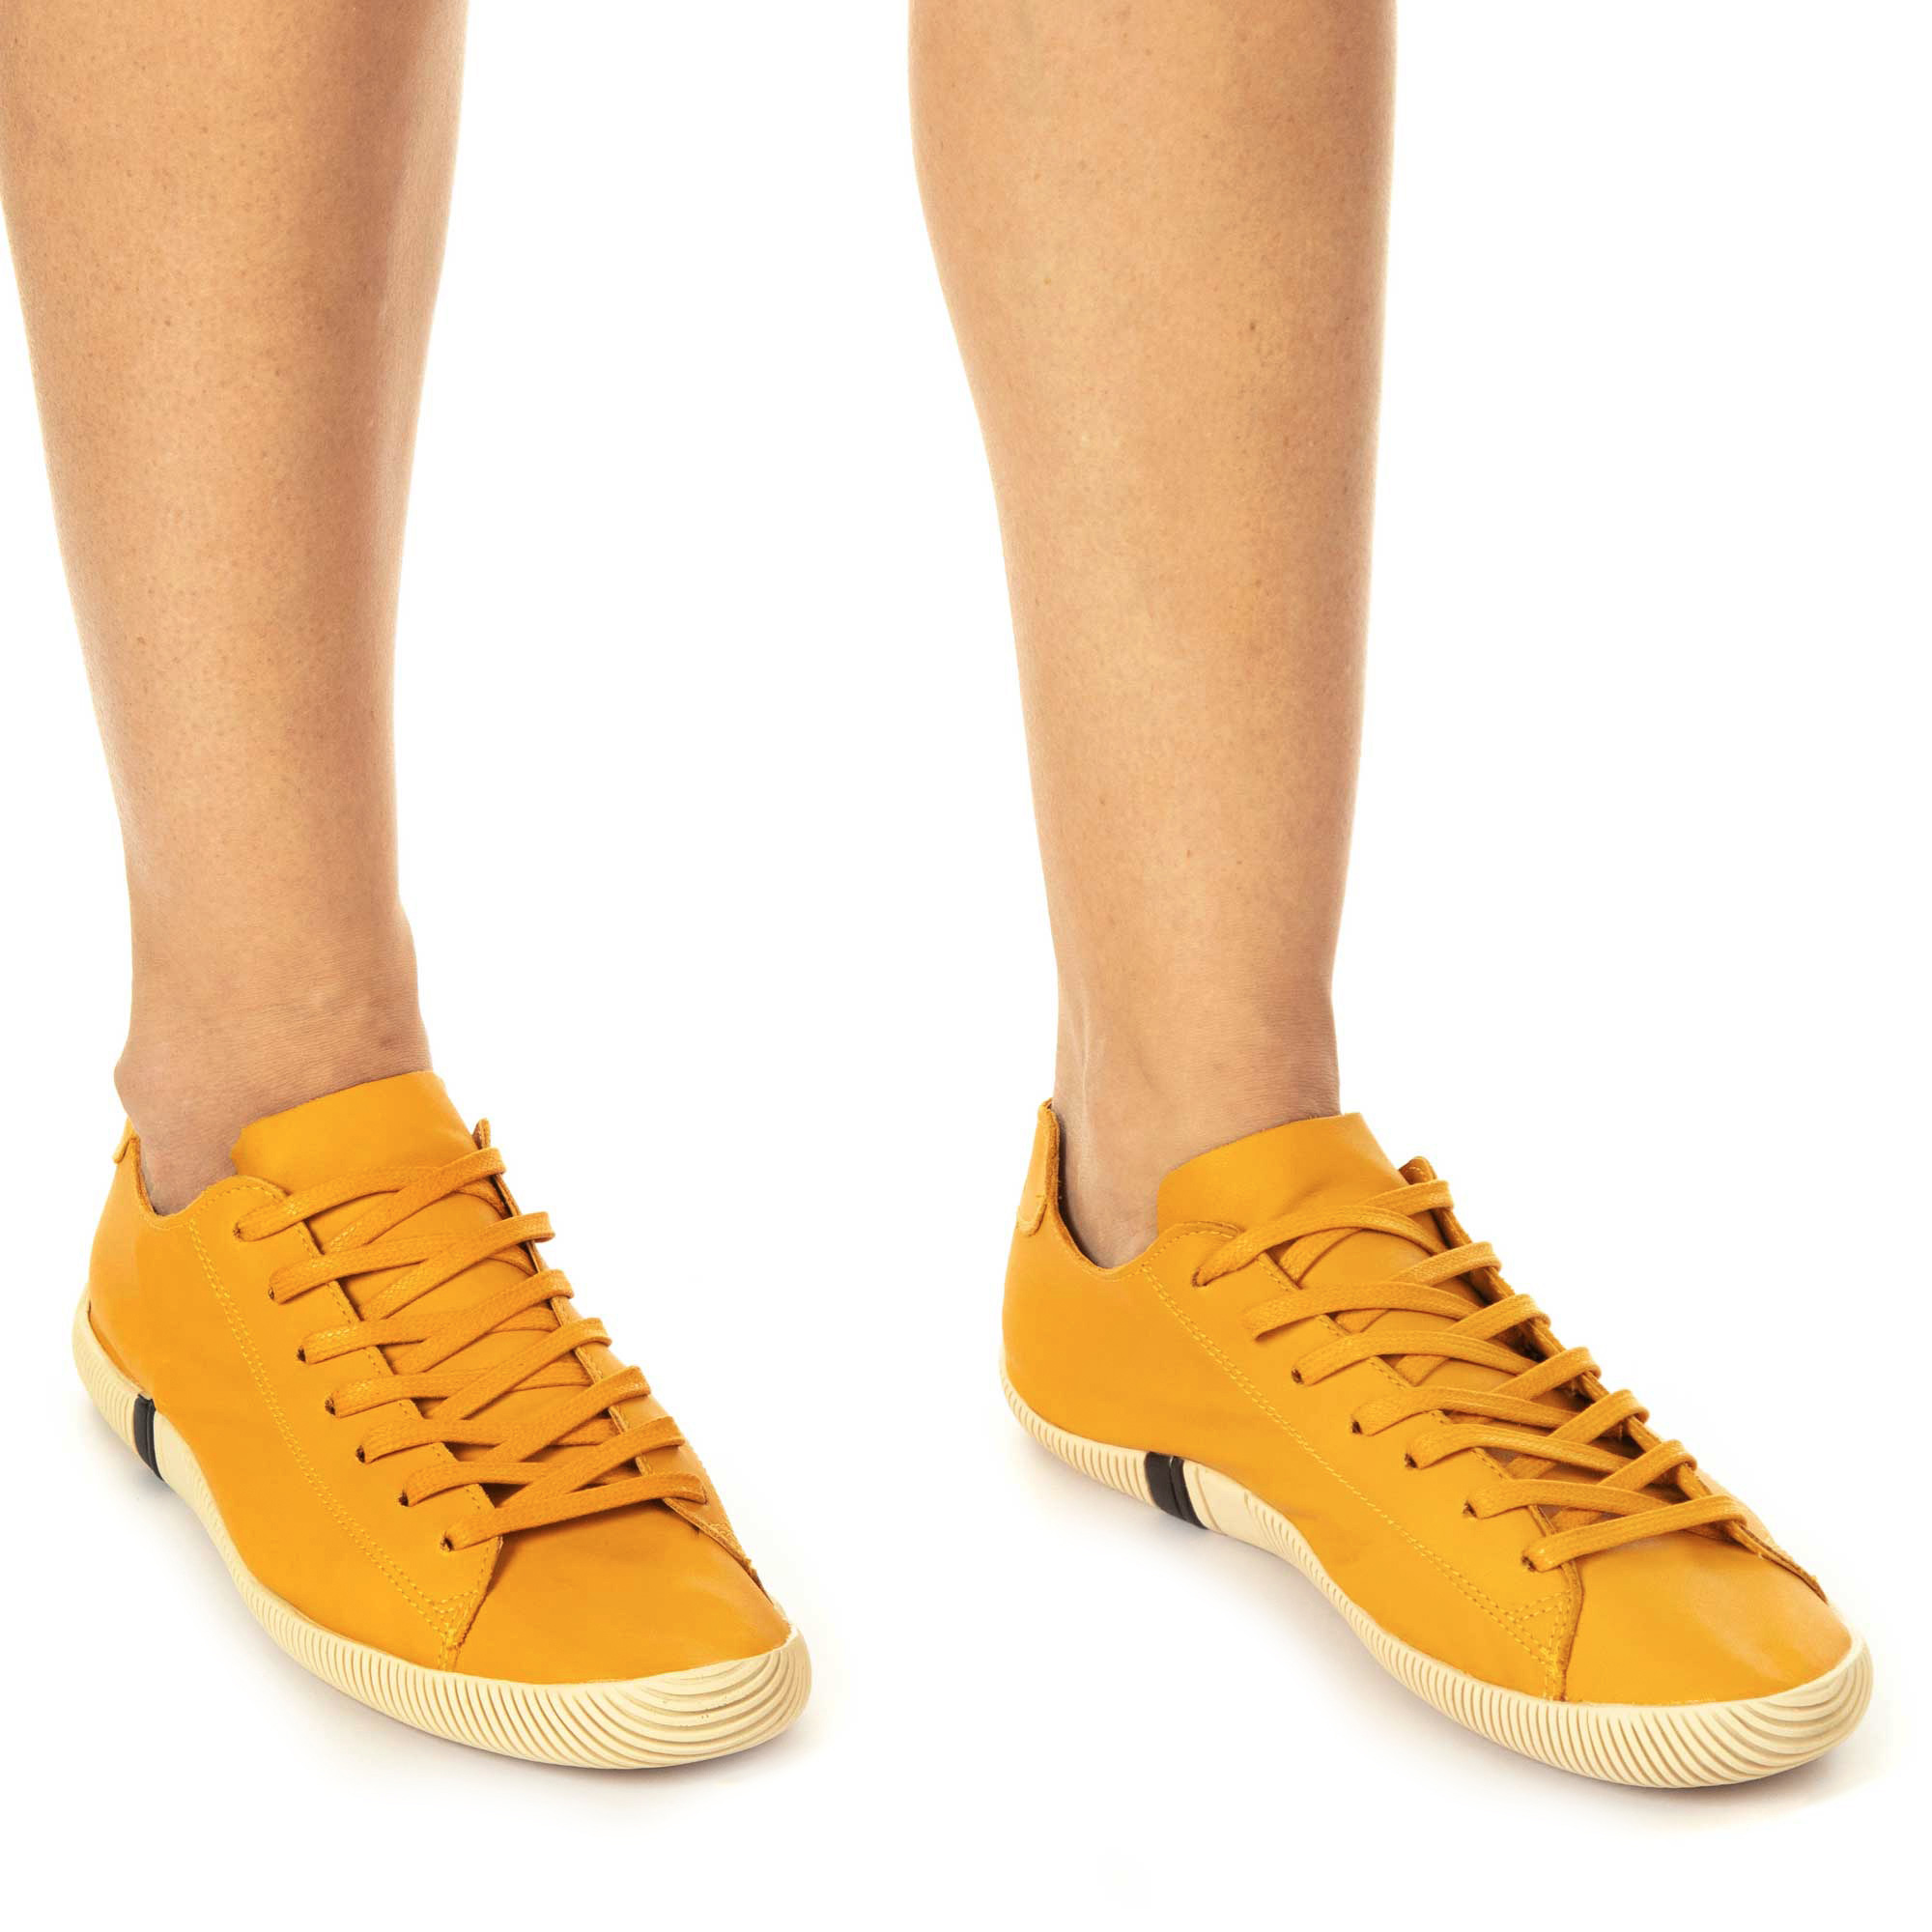 Osklen Sapatênis Soft Arpoador Feminino Amarelo